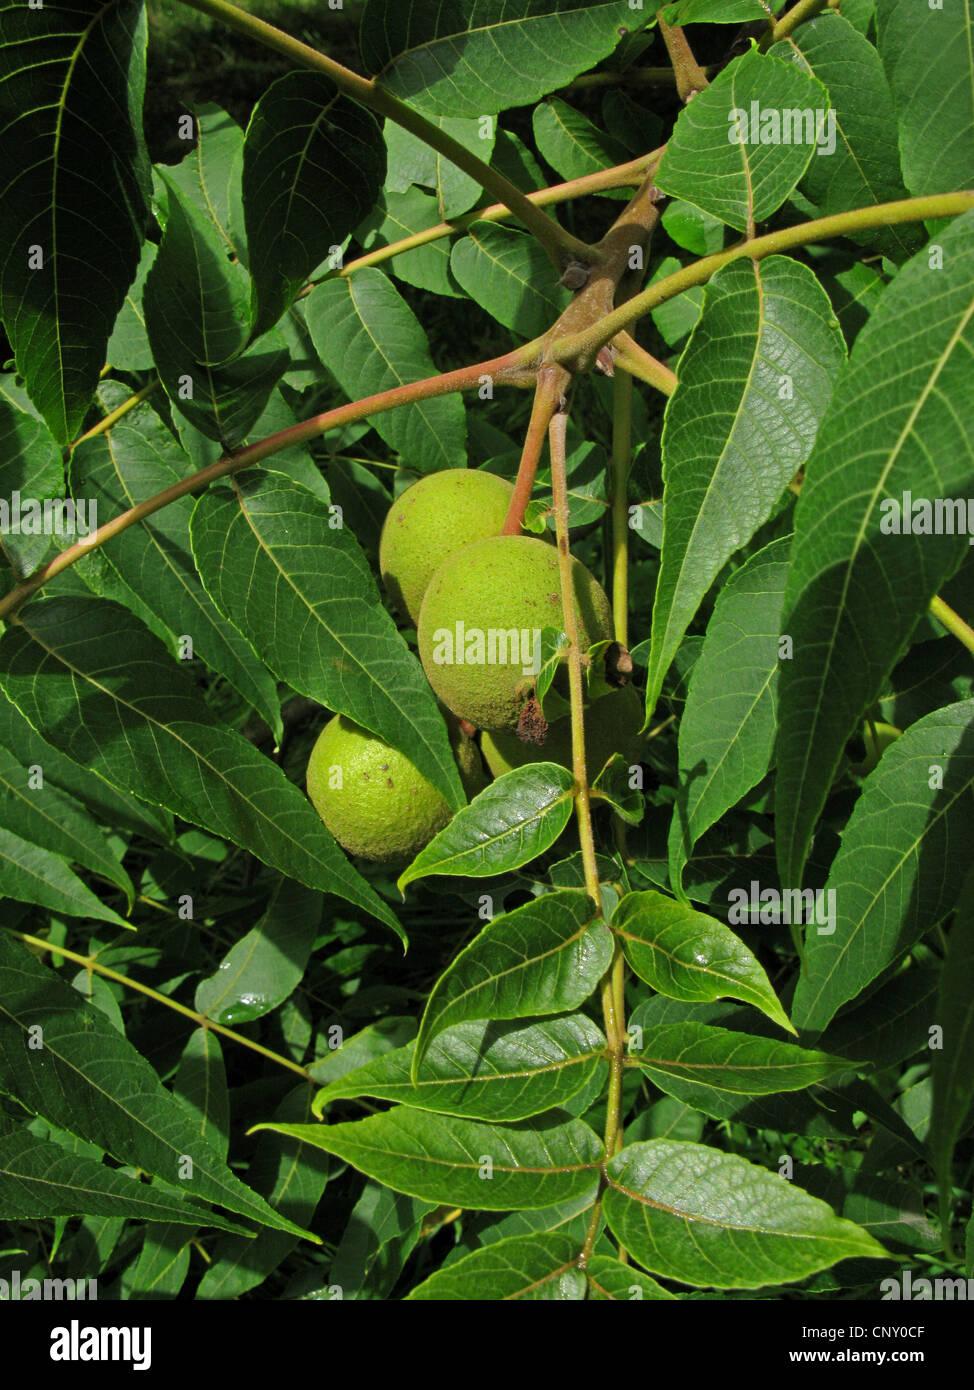 fruits a jagel stock photos fruits a jagel stock images alamy. Black Bedroom Furniture Sets. Home Design Ideas